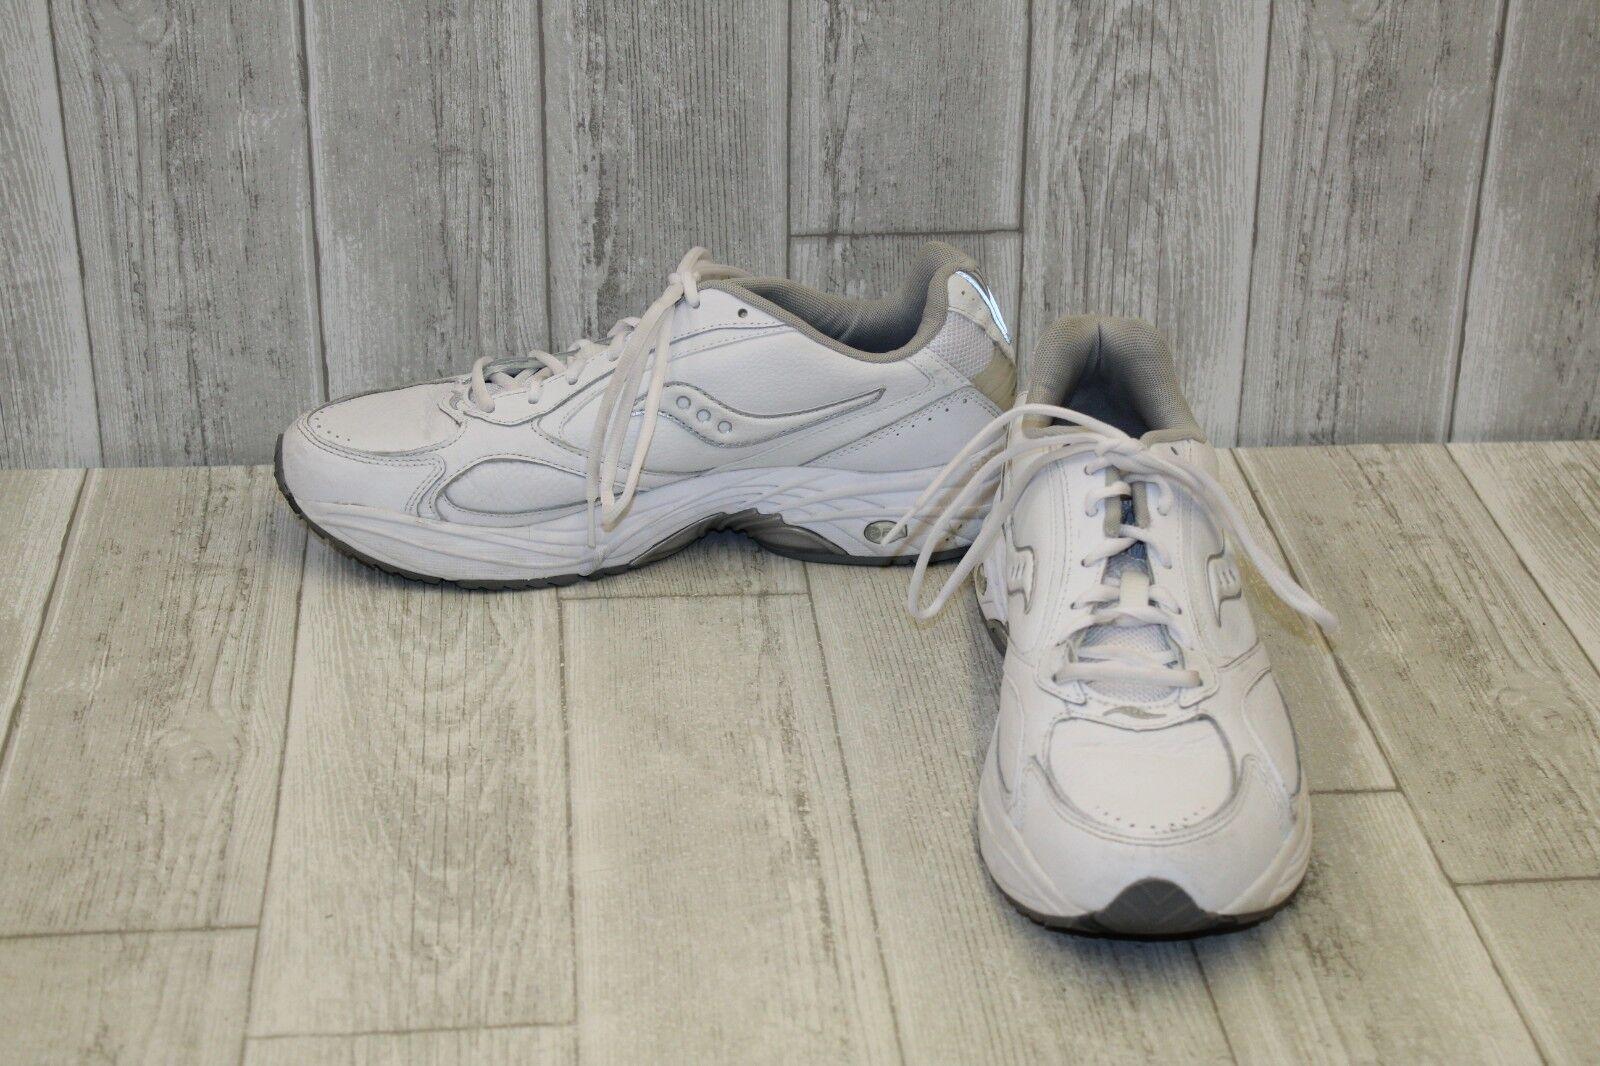 Saucony Grid Omni Walker Sneaker - Men's Size 12 White